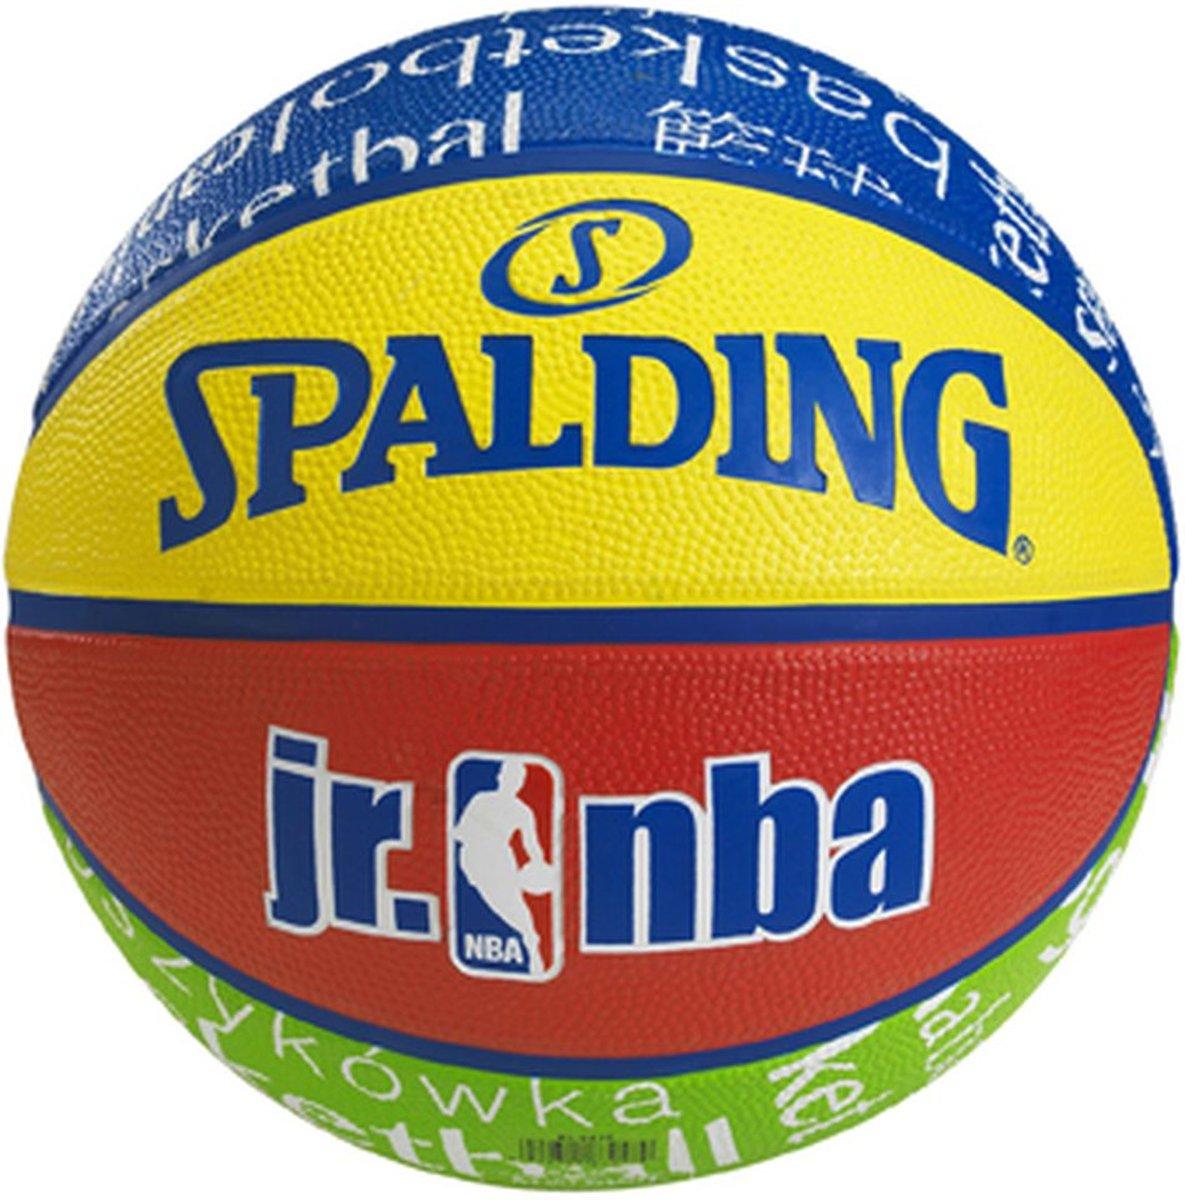 Spalding basketbal NBA Jr. - Maat 5 - Outdoor